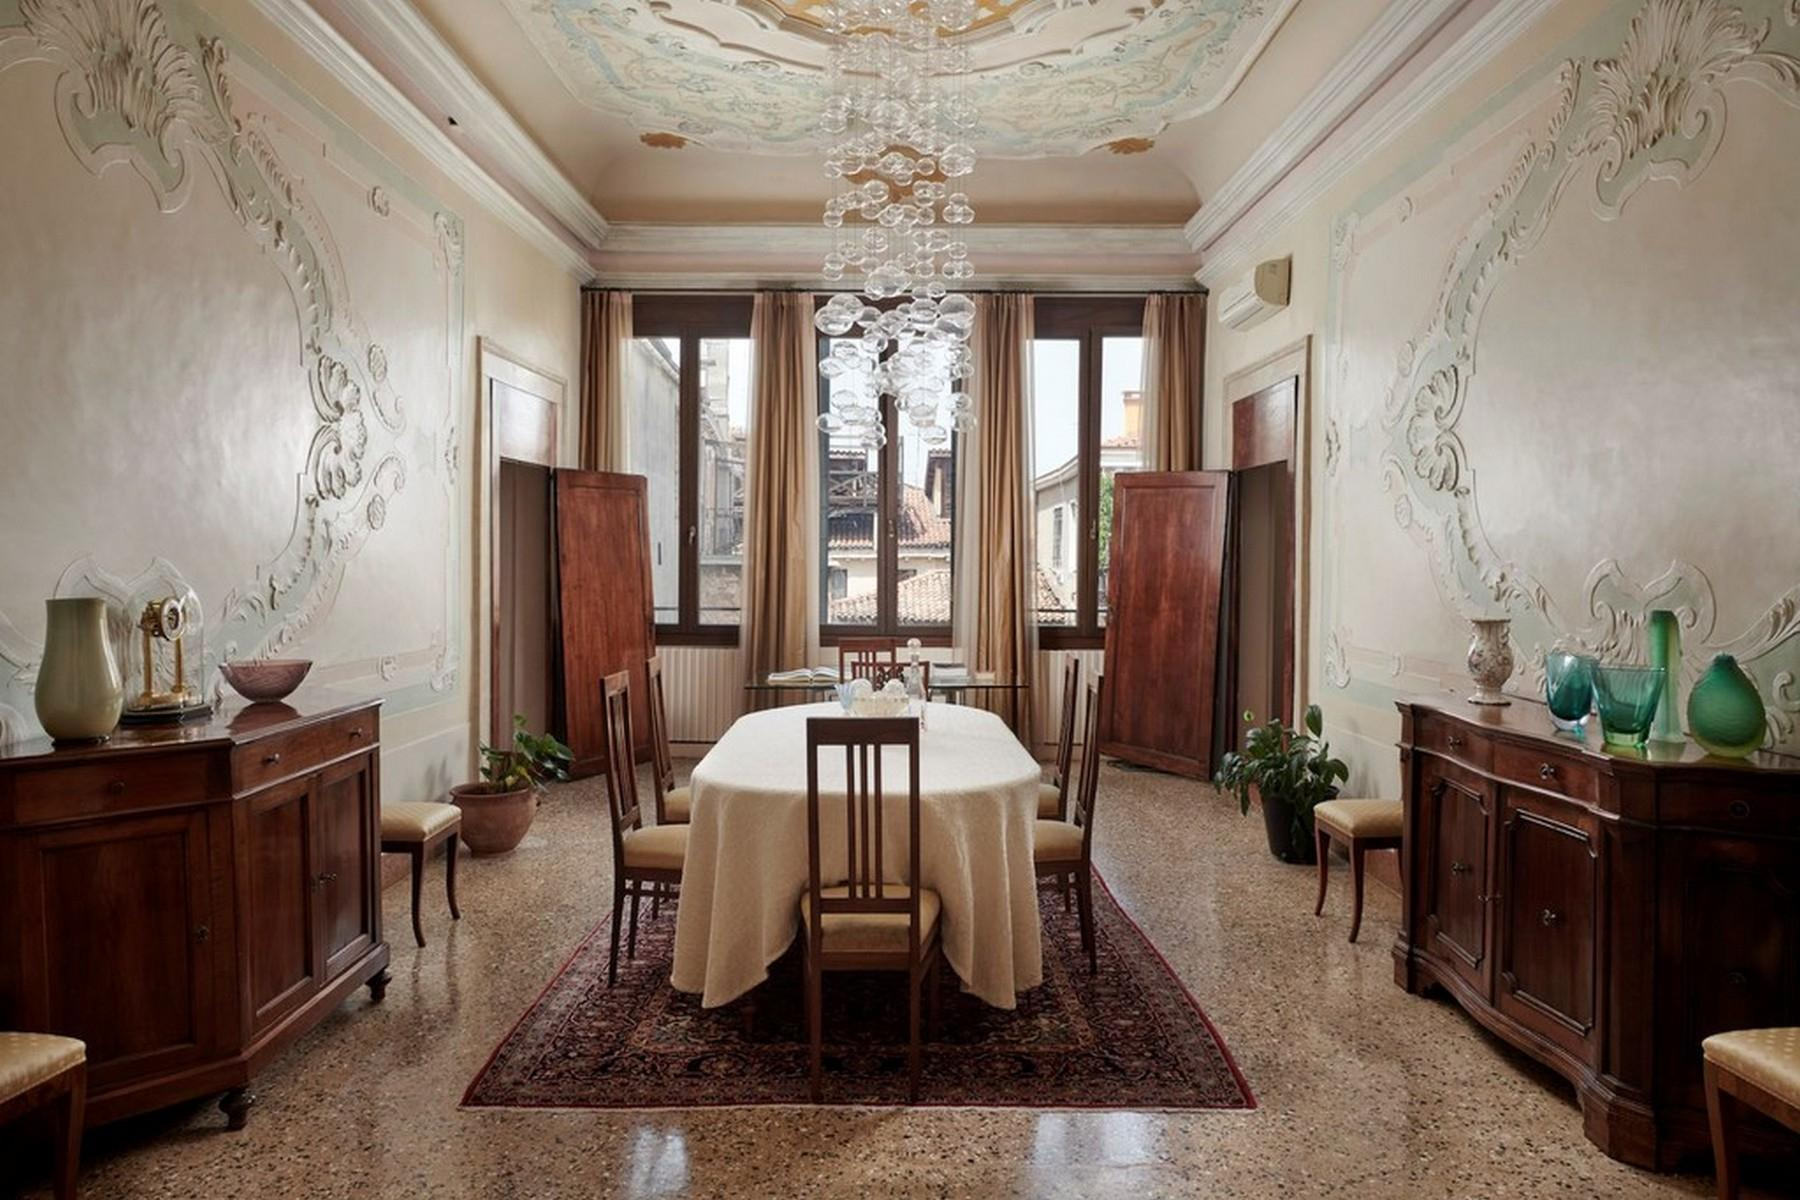 Elegante secondo Piano Nobile in un Palazzo - 1